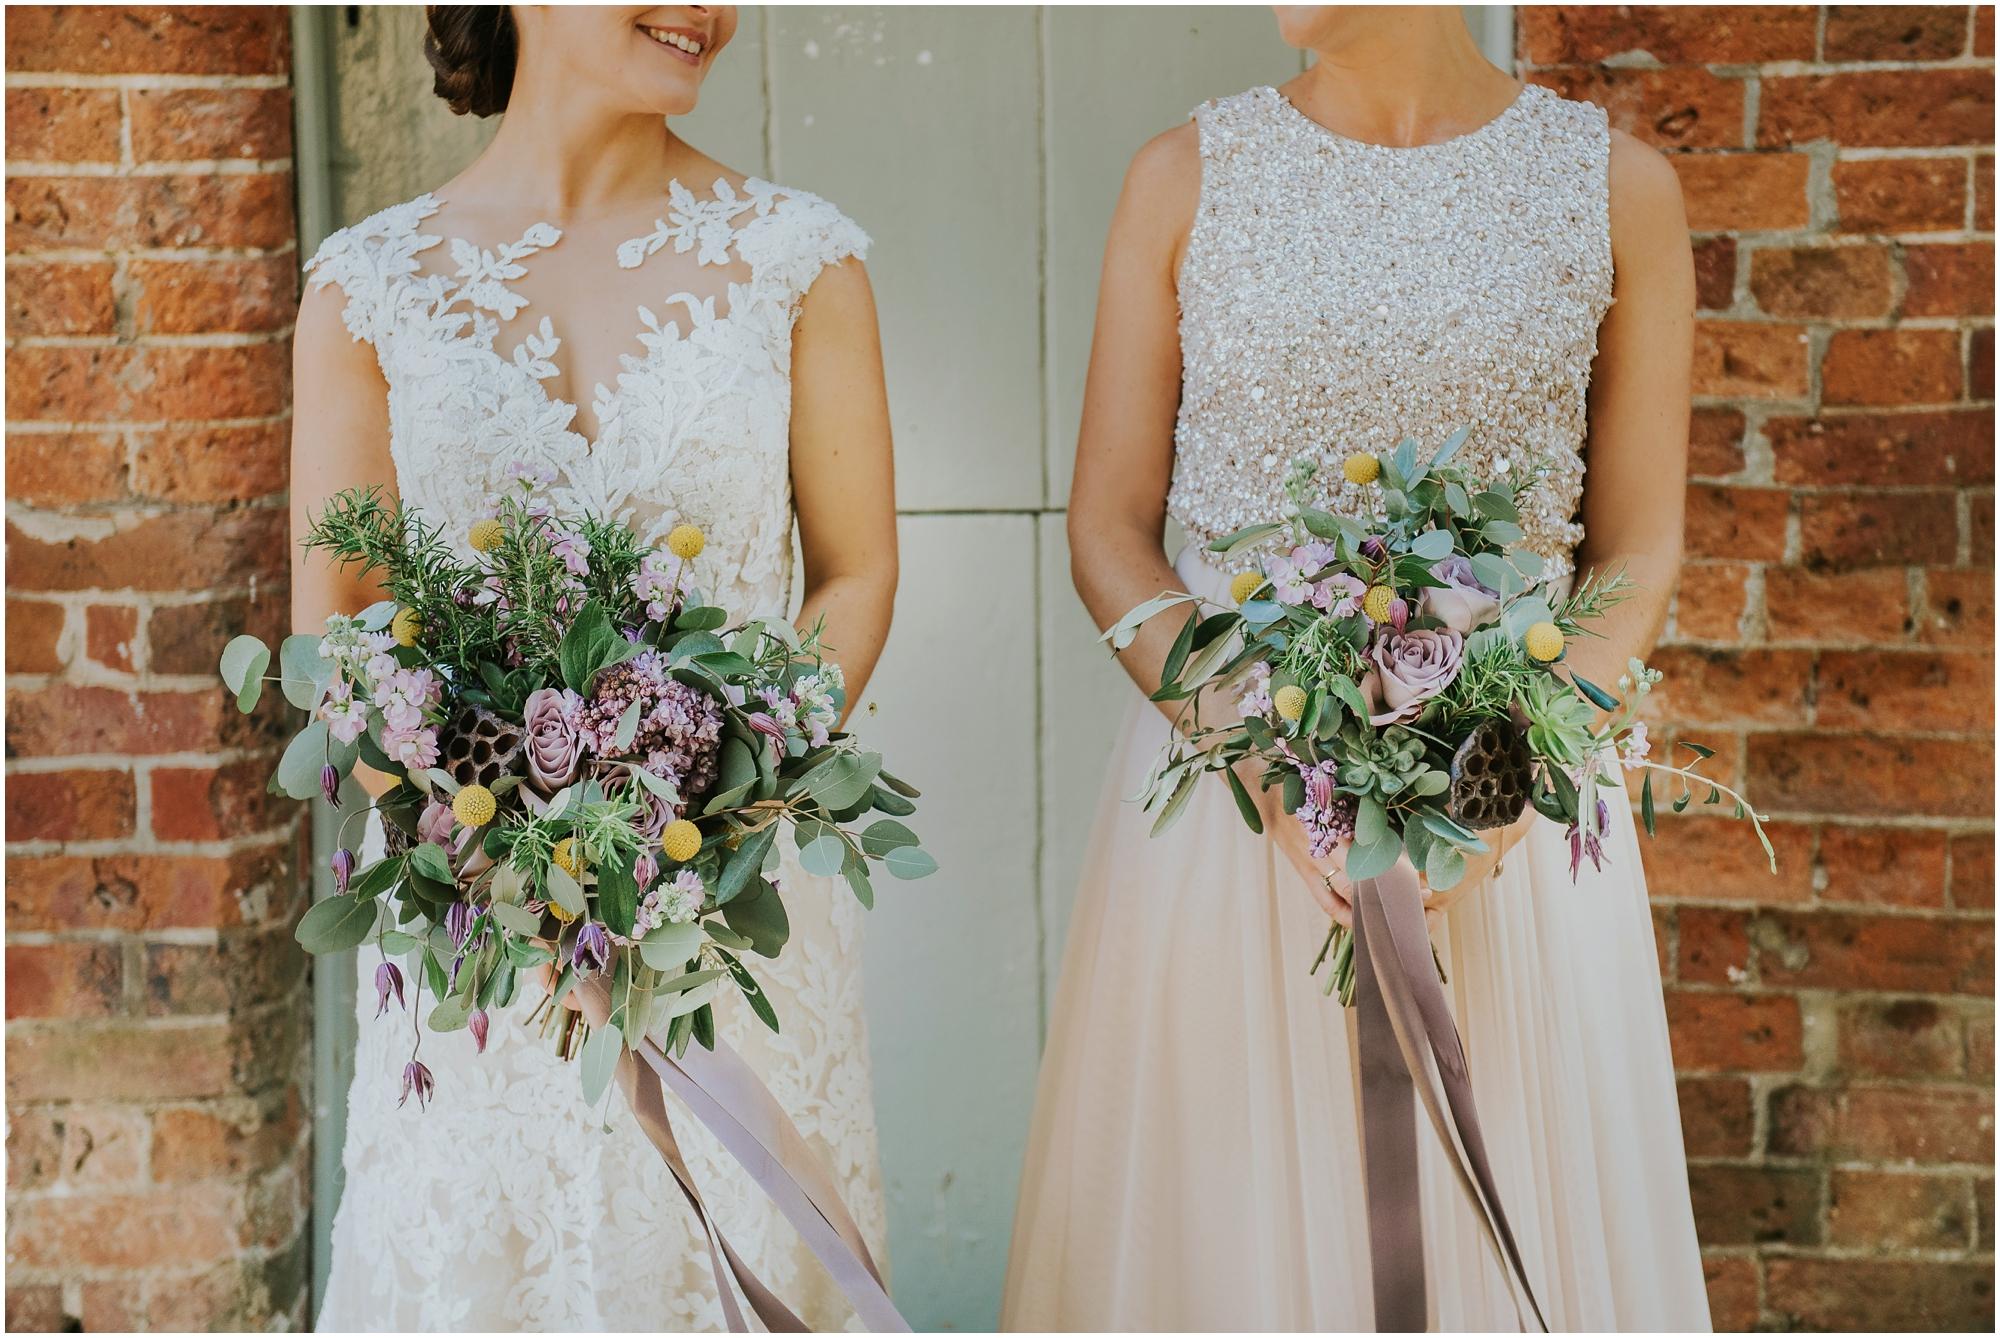 Sopley_Mill_Wedding_SamanthaDavisPhotography013.jpg